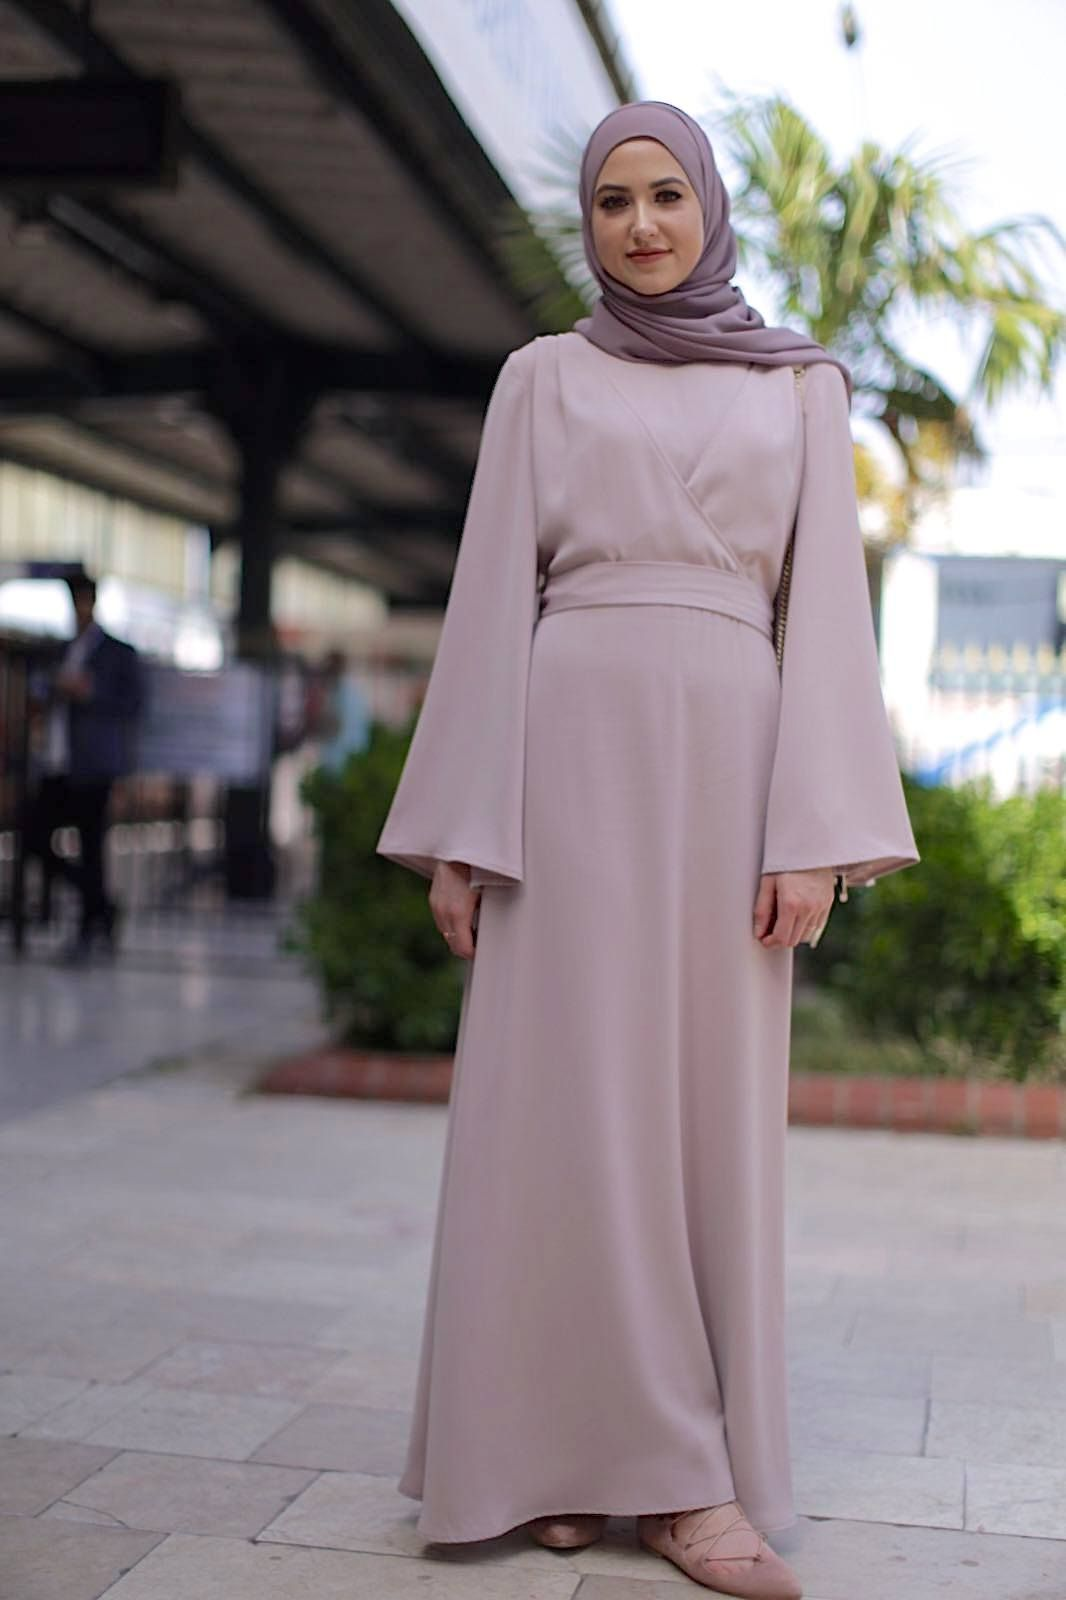 18 Fancy Abaya Designs – Ideas How to Wear Abaya Fashionably